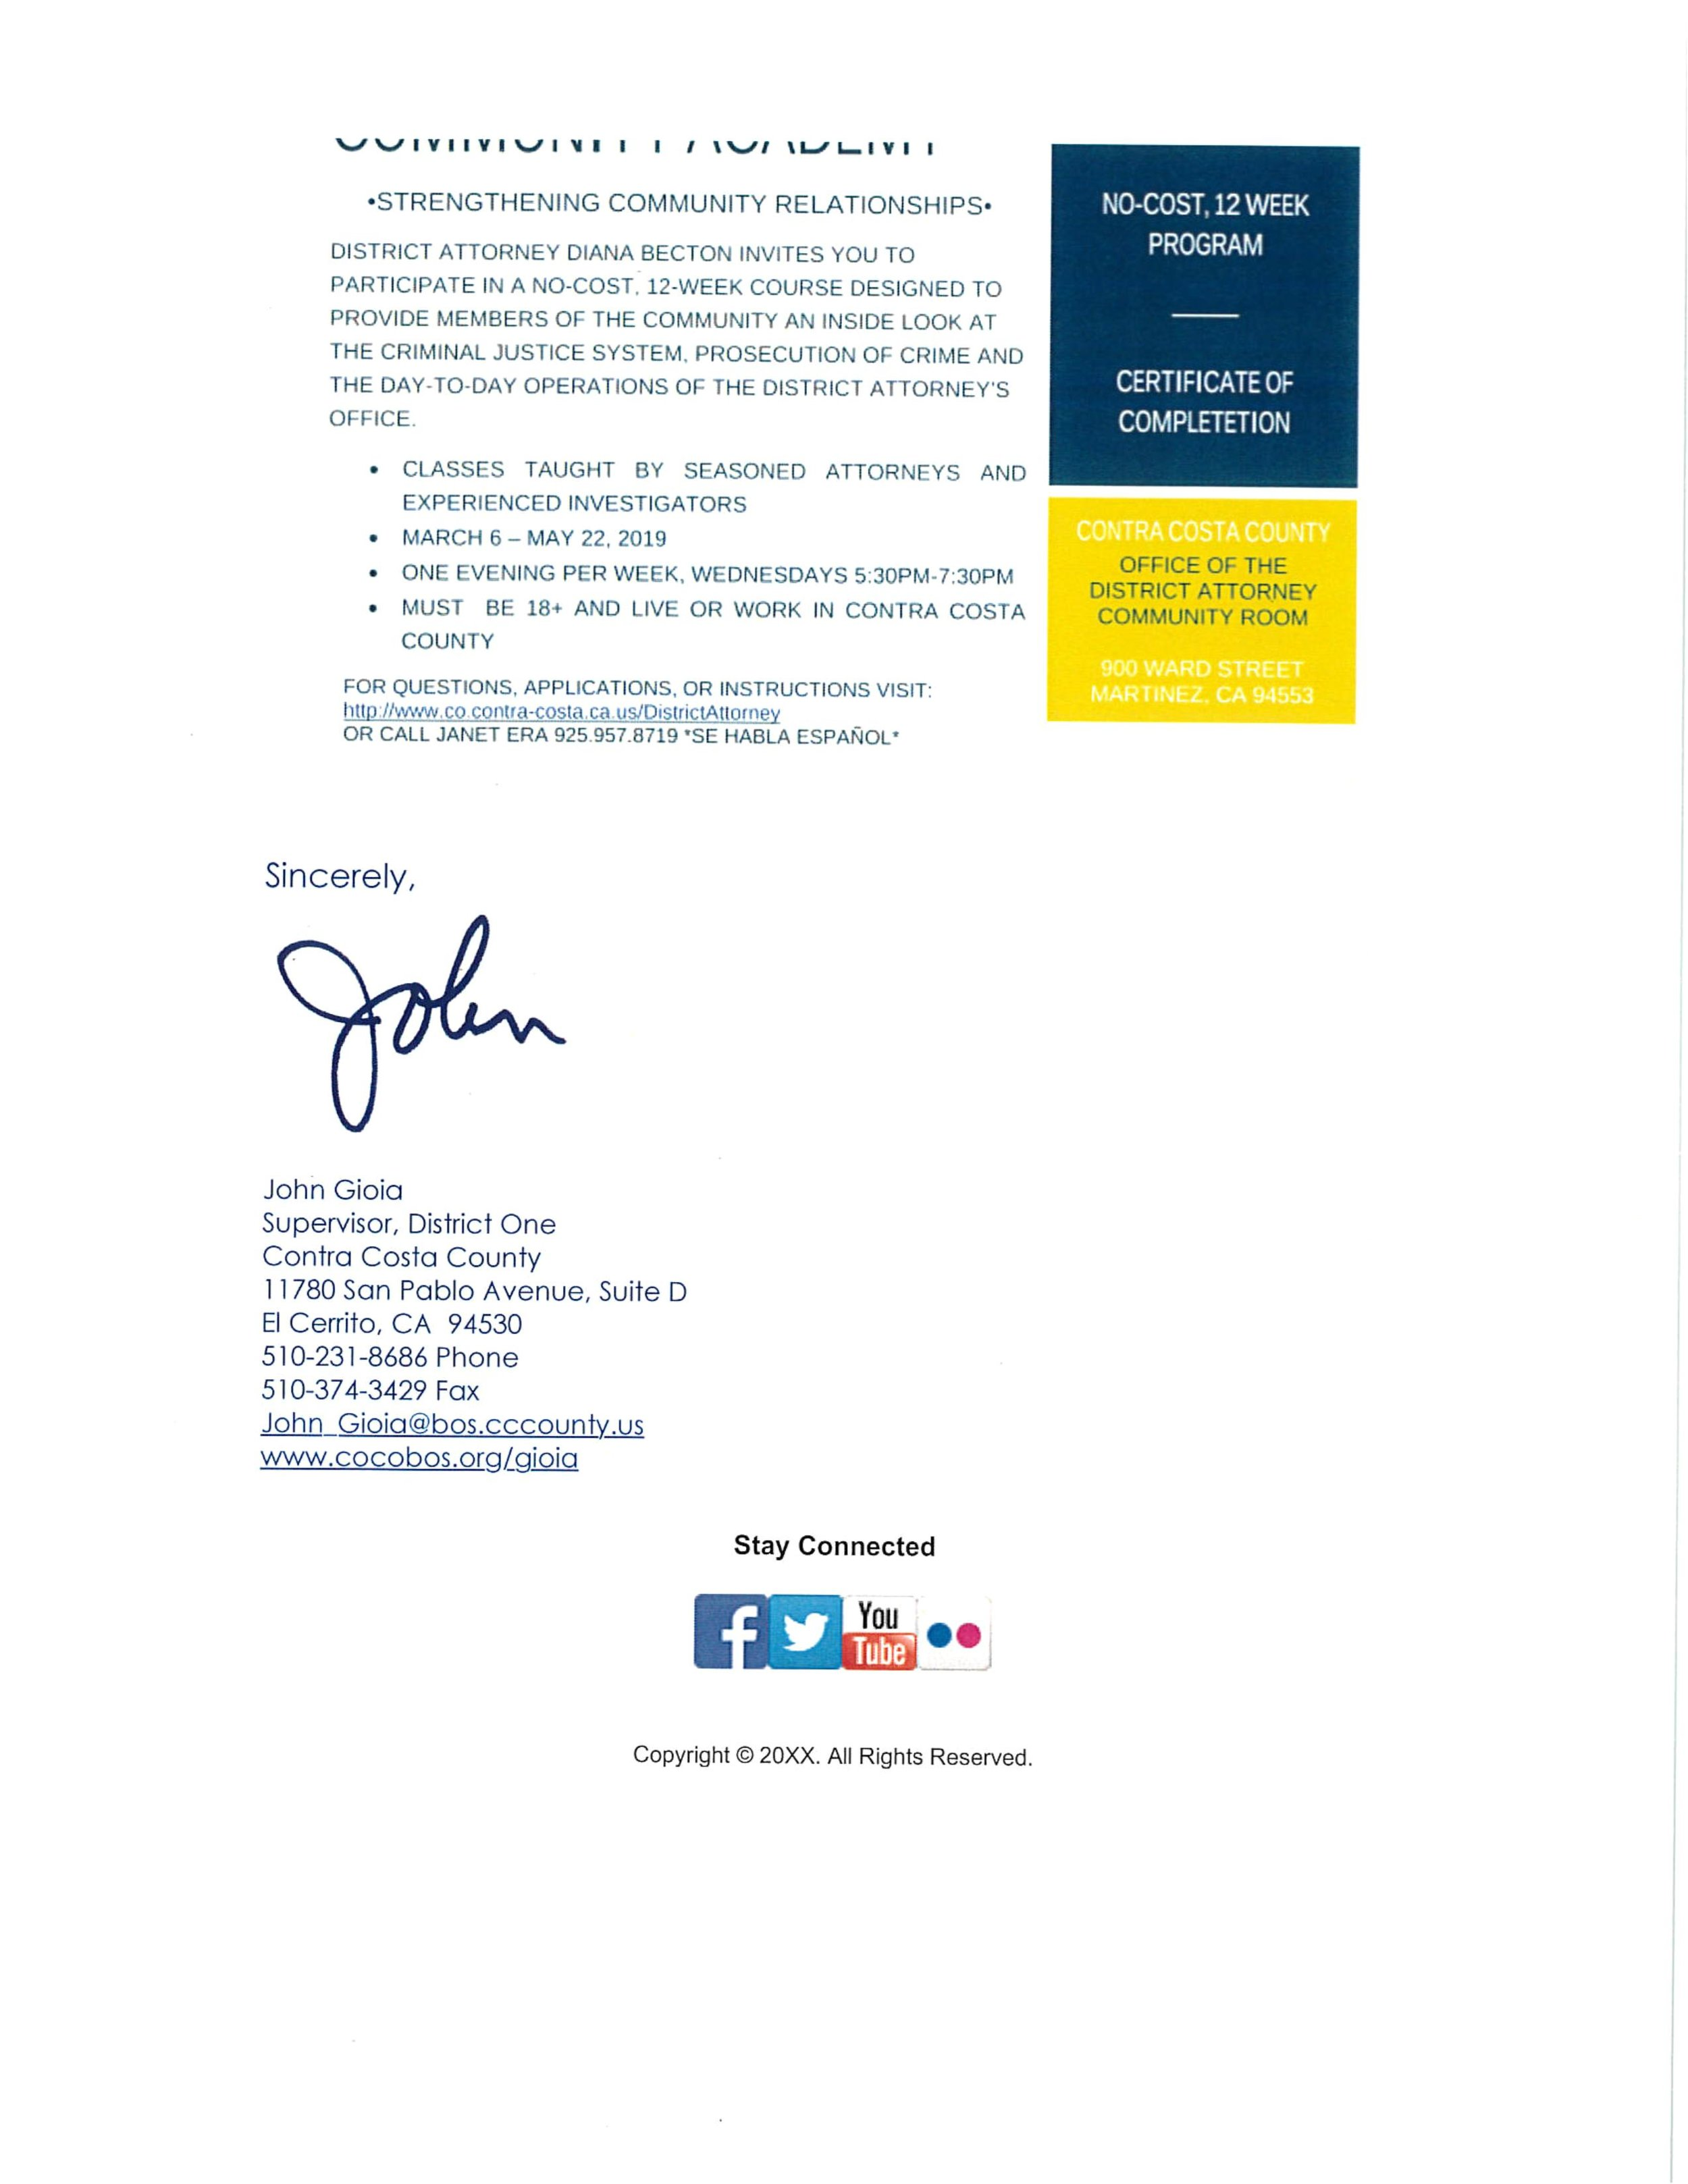 ESMAC Agenda 2.13.2019b_50.jpg